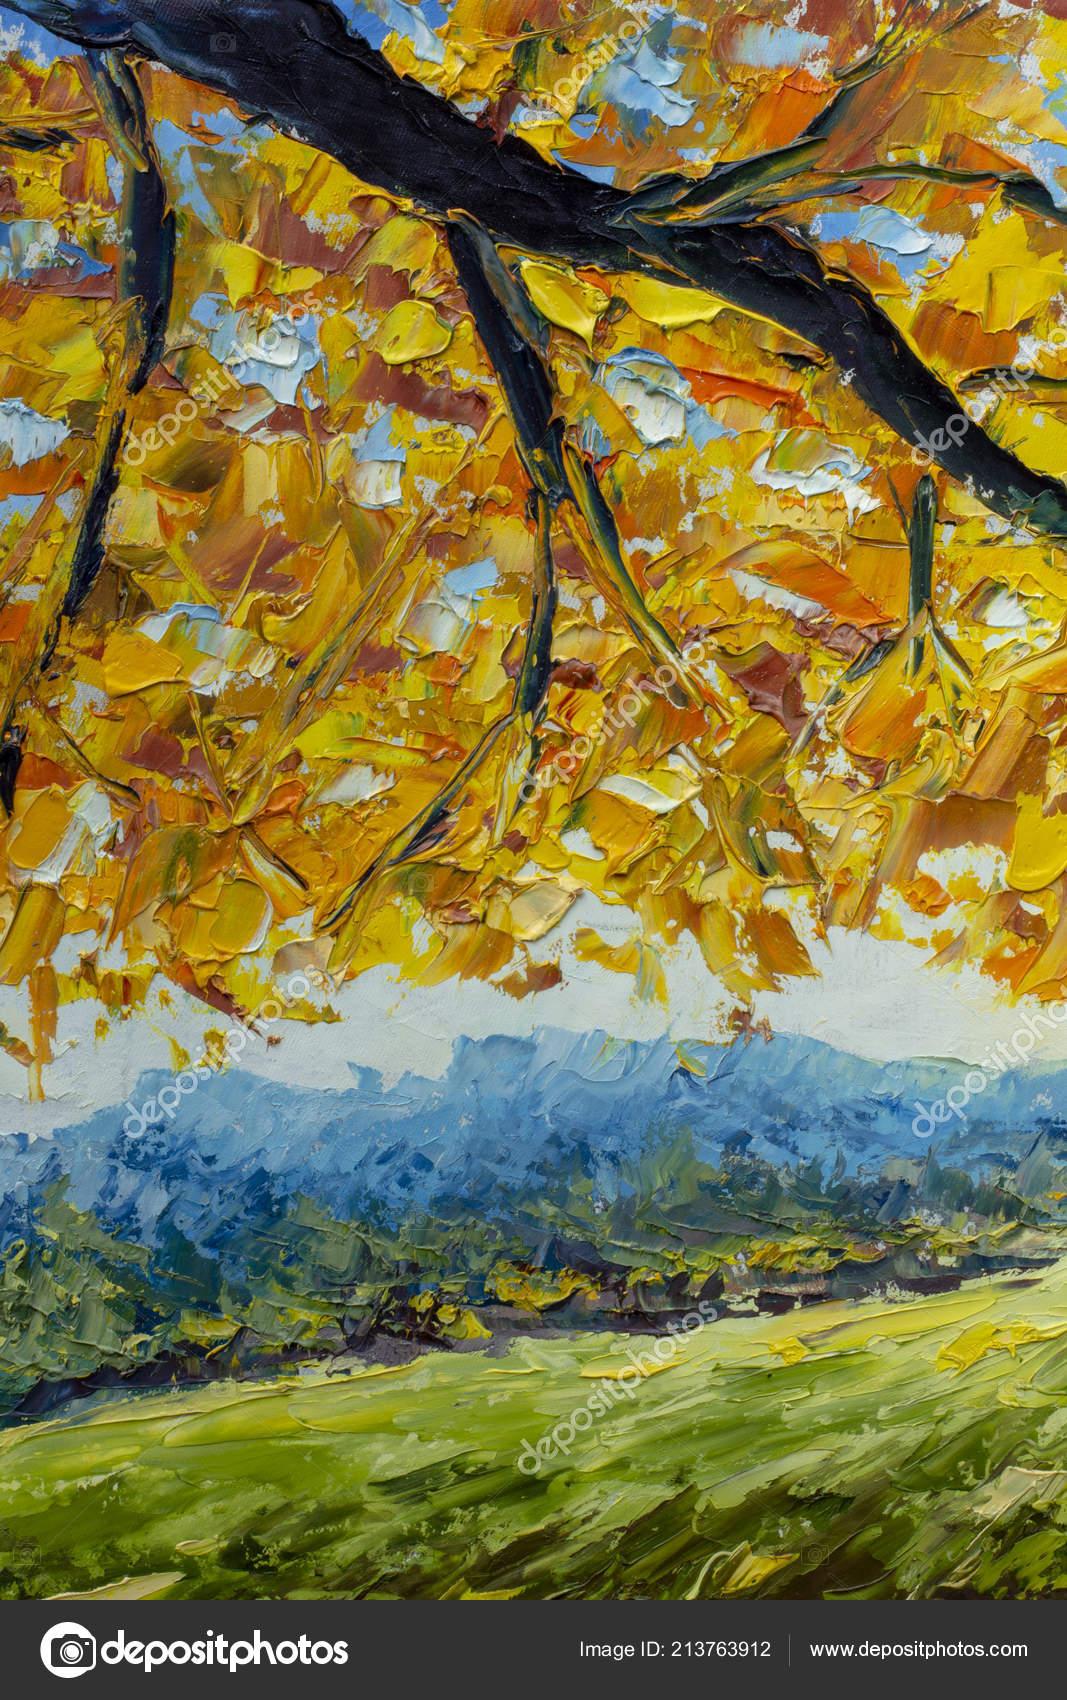 Branch Autumn Tree Golden Orange Foliage Green Field Autumn Landscape Stock Photo Image By C Weris7554 213763912